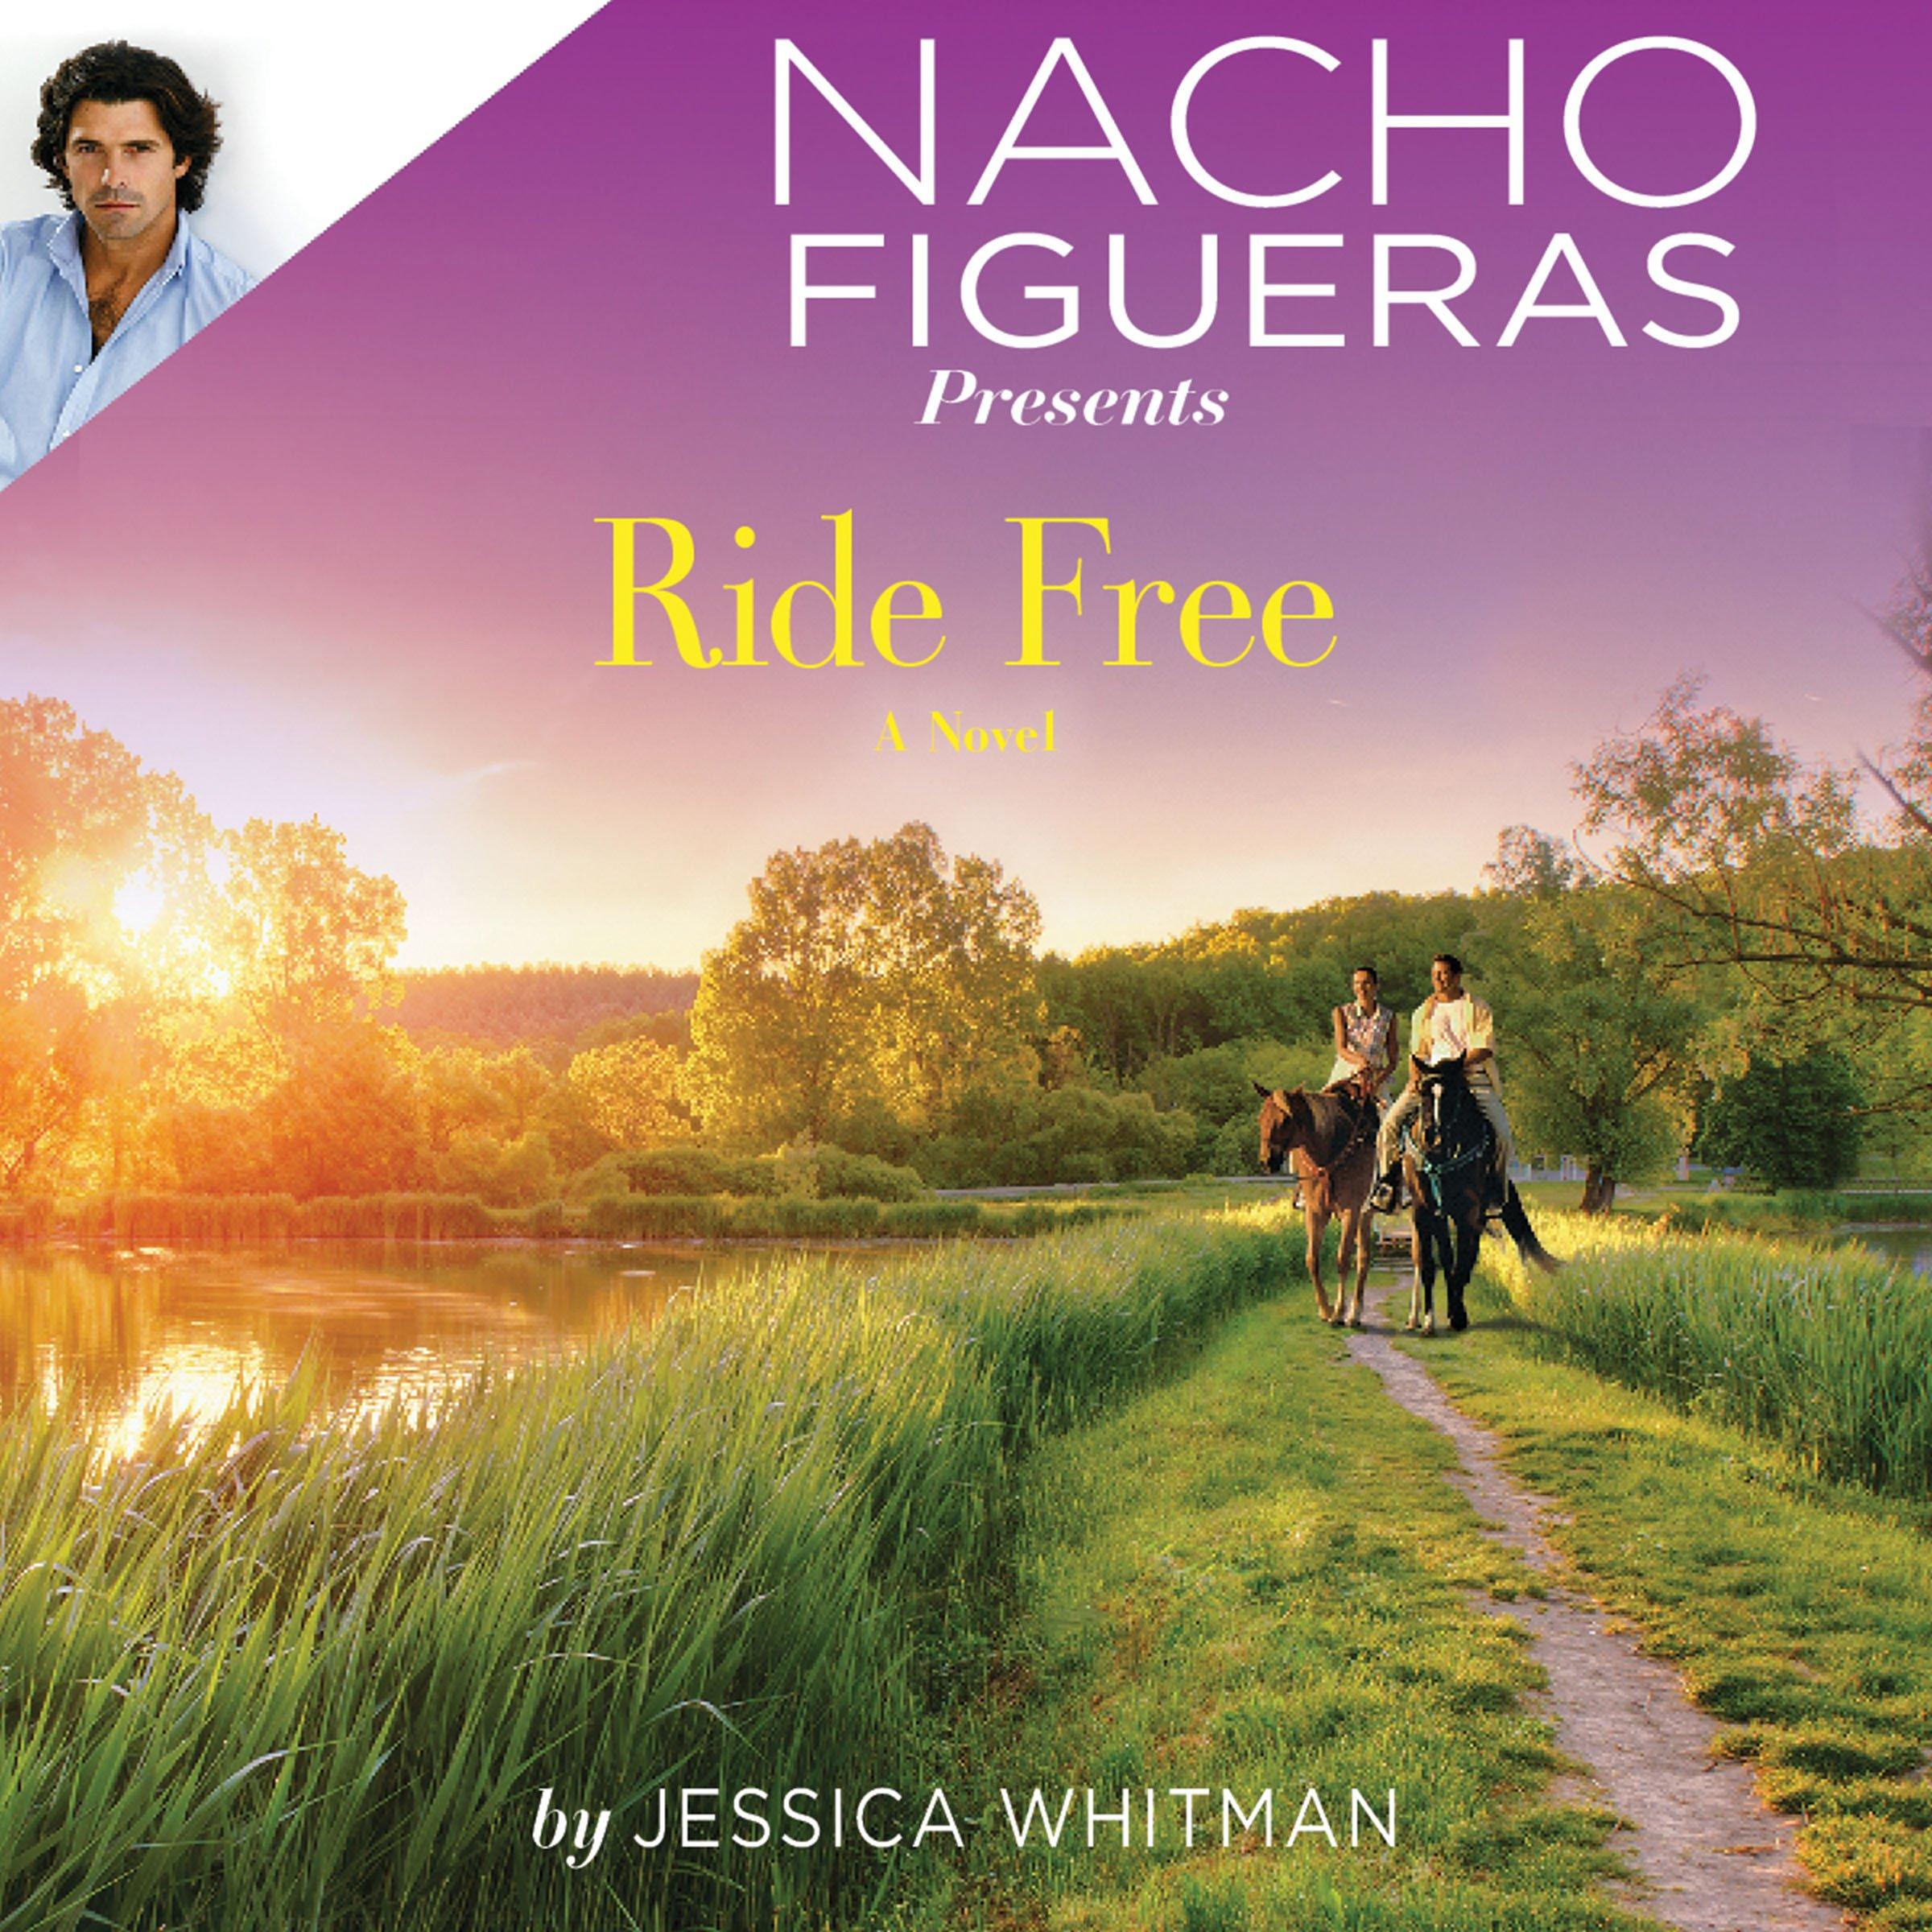 Nacho Figueras Presents: Ride Free